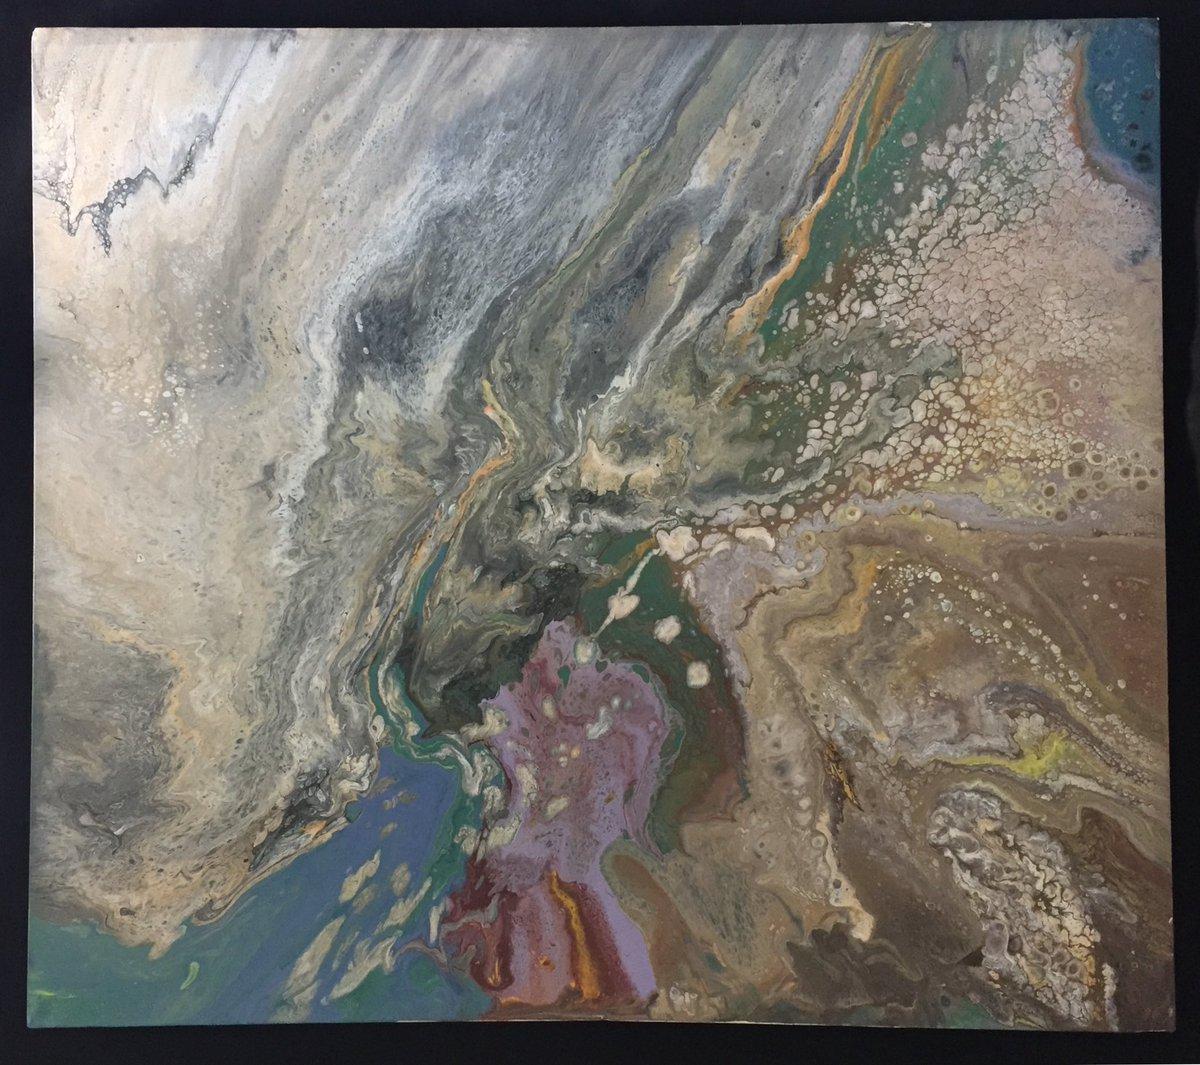 "051220-01 Acrylic on canvas 48"" x 48""(122 cm)  May 2020 #gesturalabstraction #informalism #tachisme #gutai #kunst #actionpainting #fineart #abstract #gallery #abstractexpressionism #acrylicpainting #art #interiordesign #creative #painting #fluidart #contemporaryart #modernart pic.twitter.com/LjoyKSZmXY"